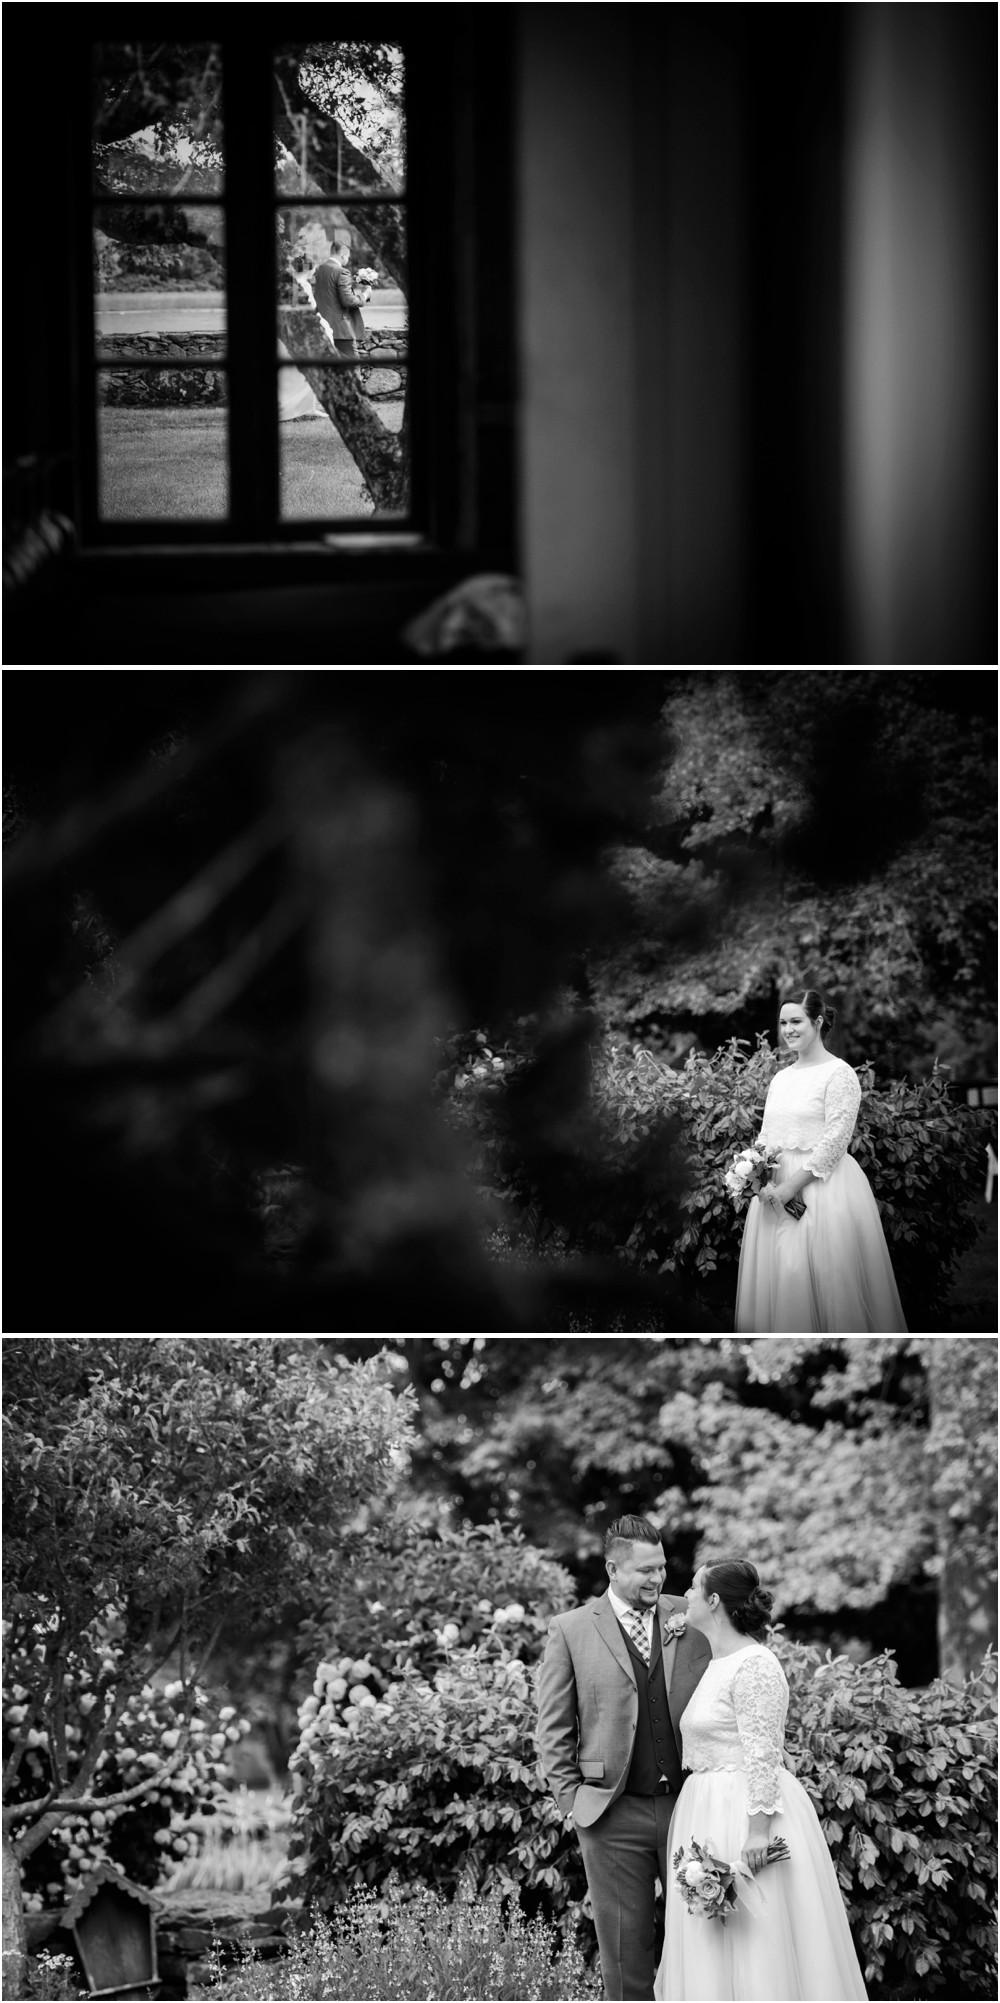 Lefebvre_Photography_2009.jpg